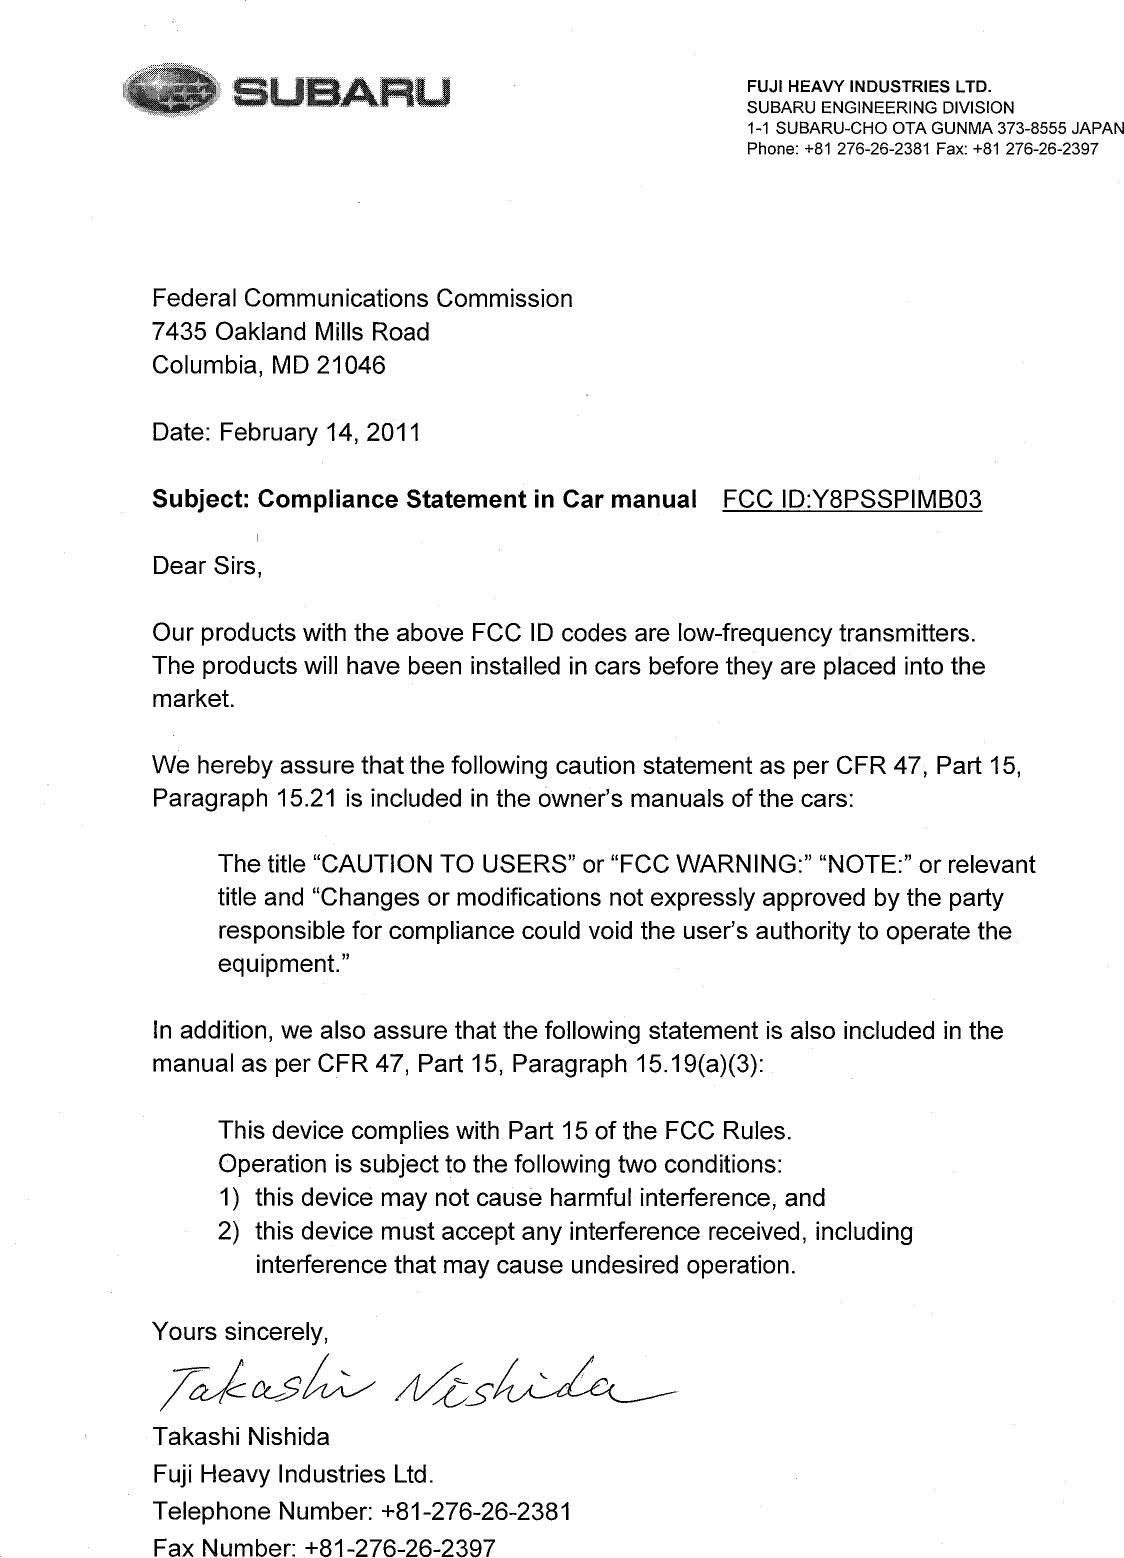 Subaru immobilizer code | Dealer Technician Order  2019-05-15